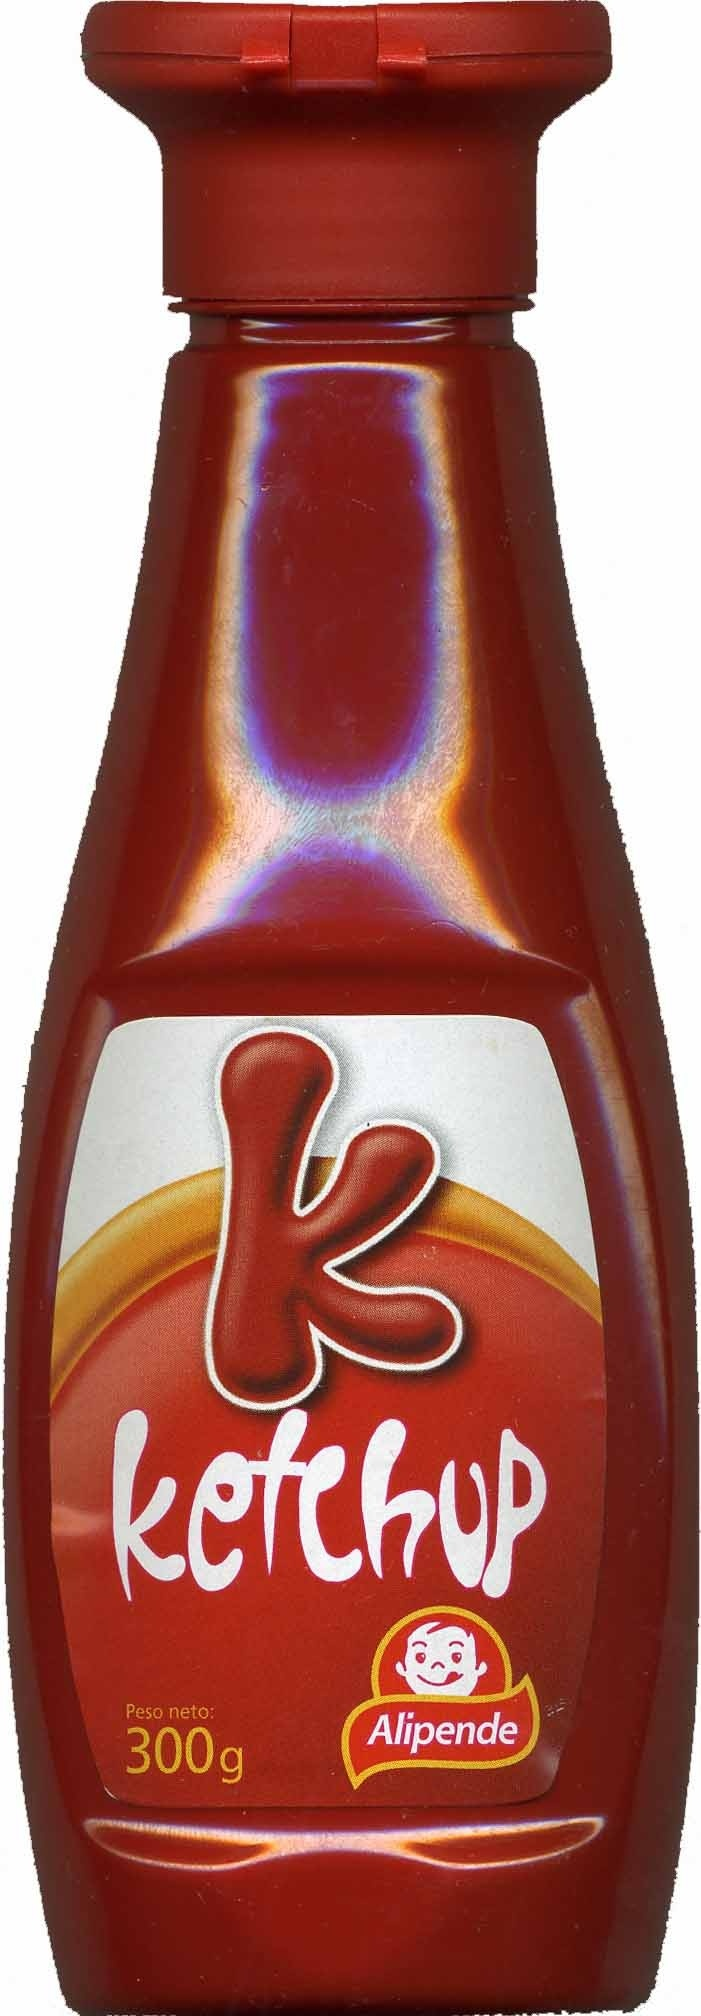 "Salsa kétchup ""Alipende"" - Producto"